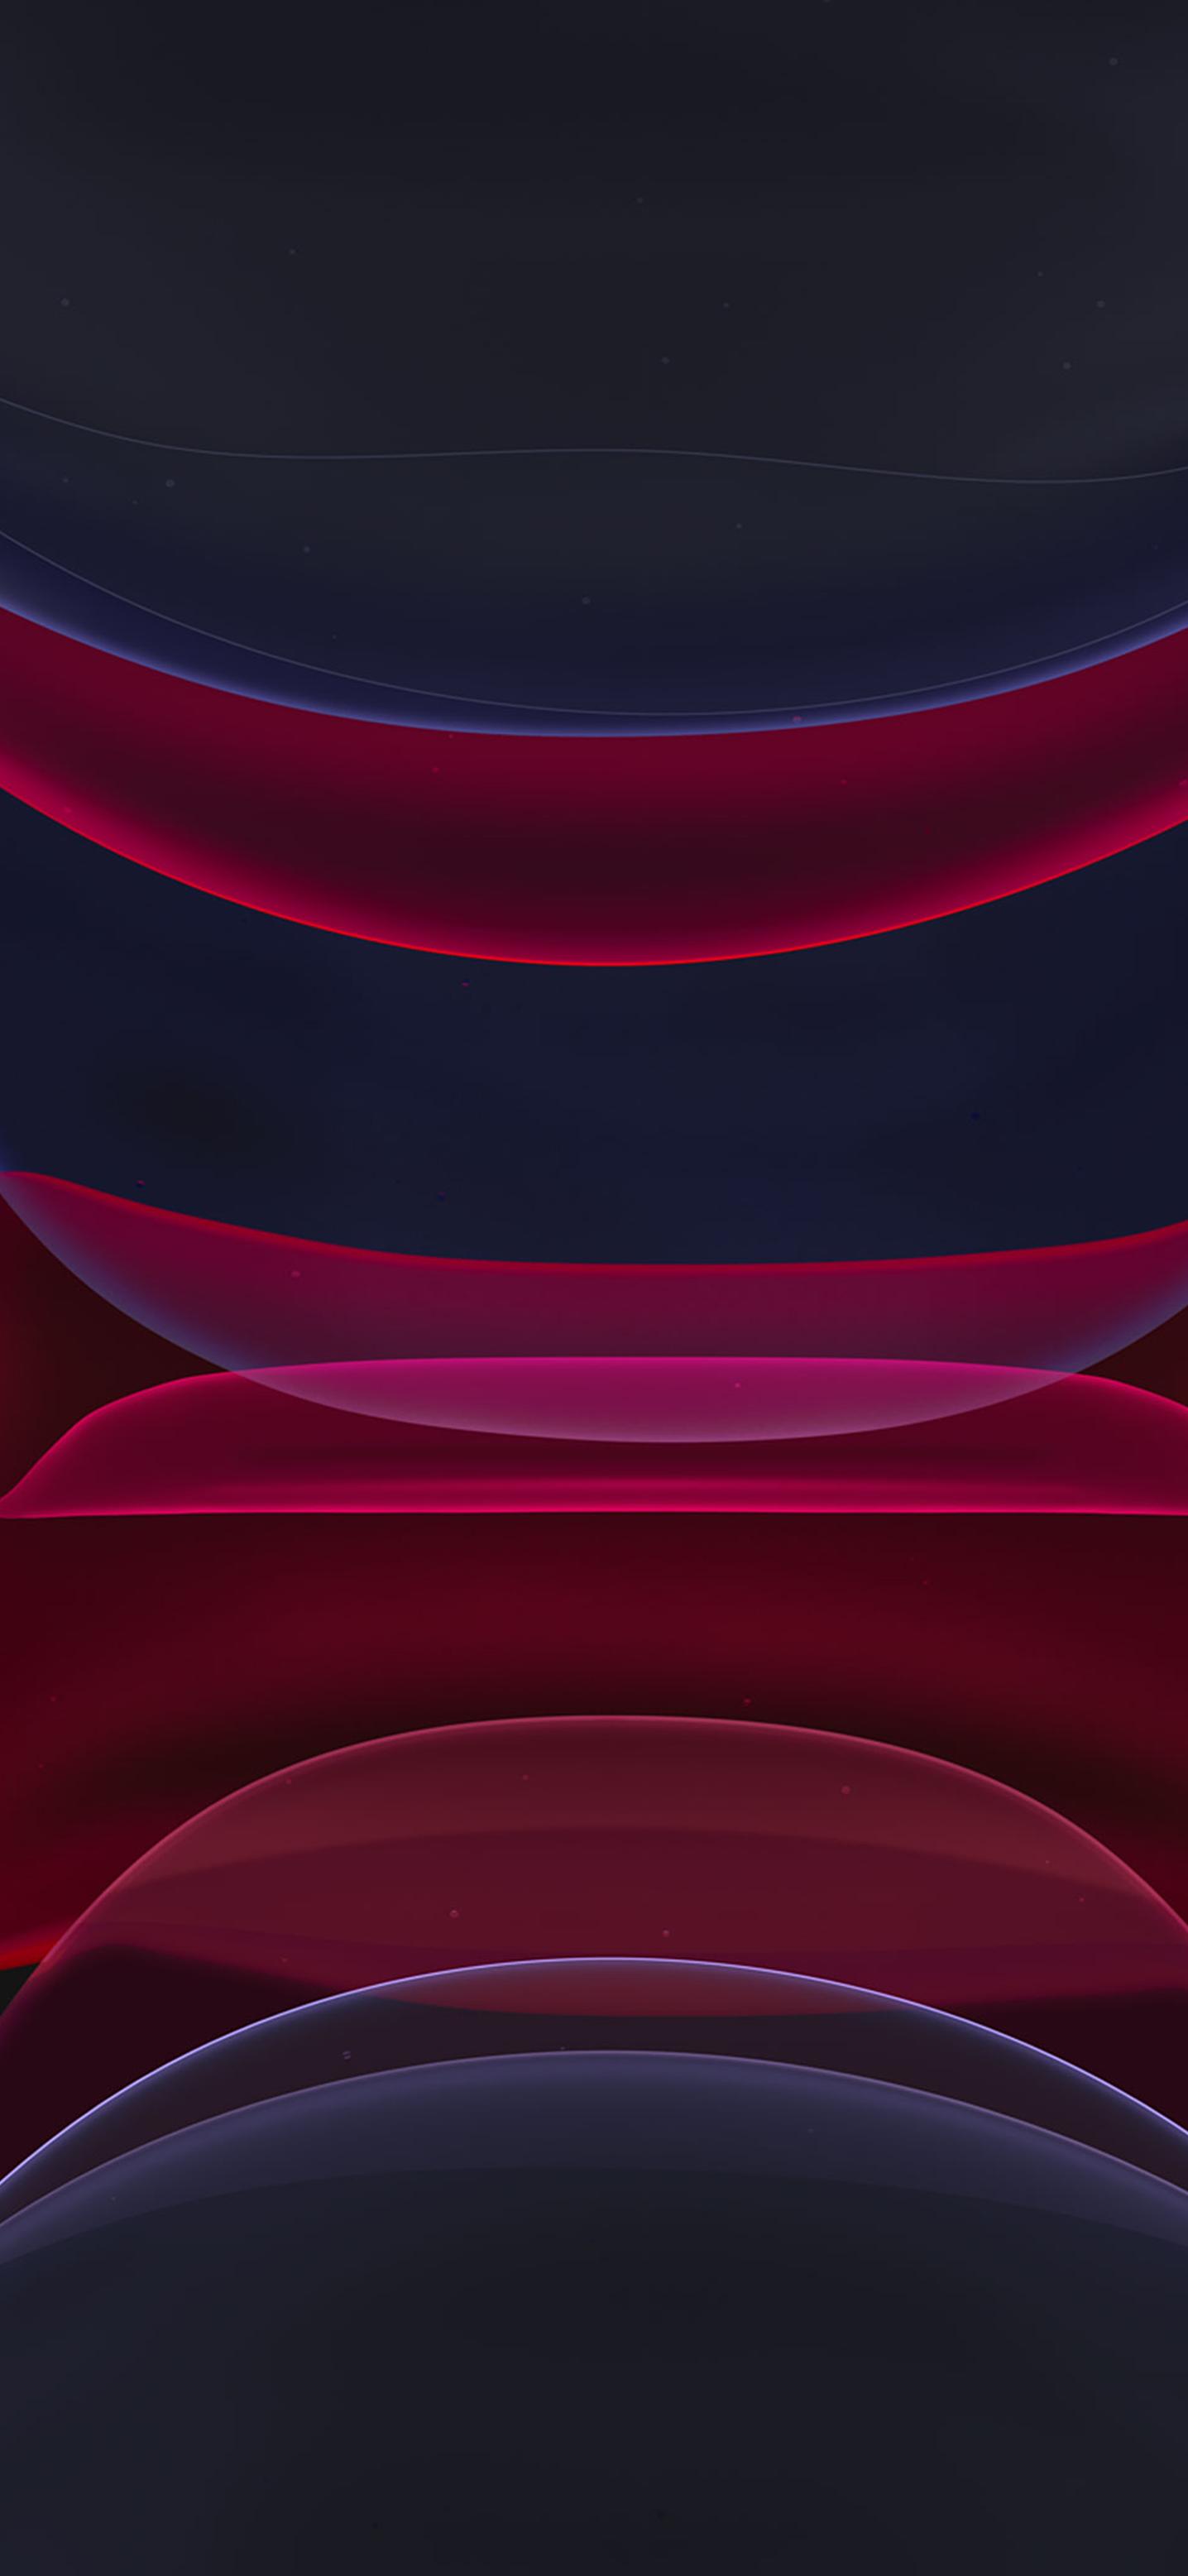 خلفيات ايفون 11